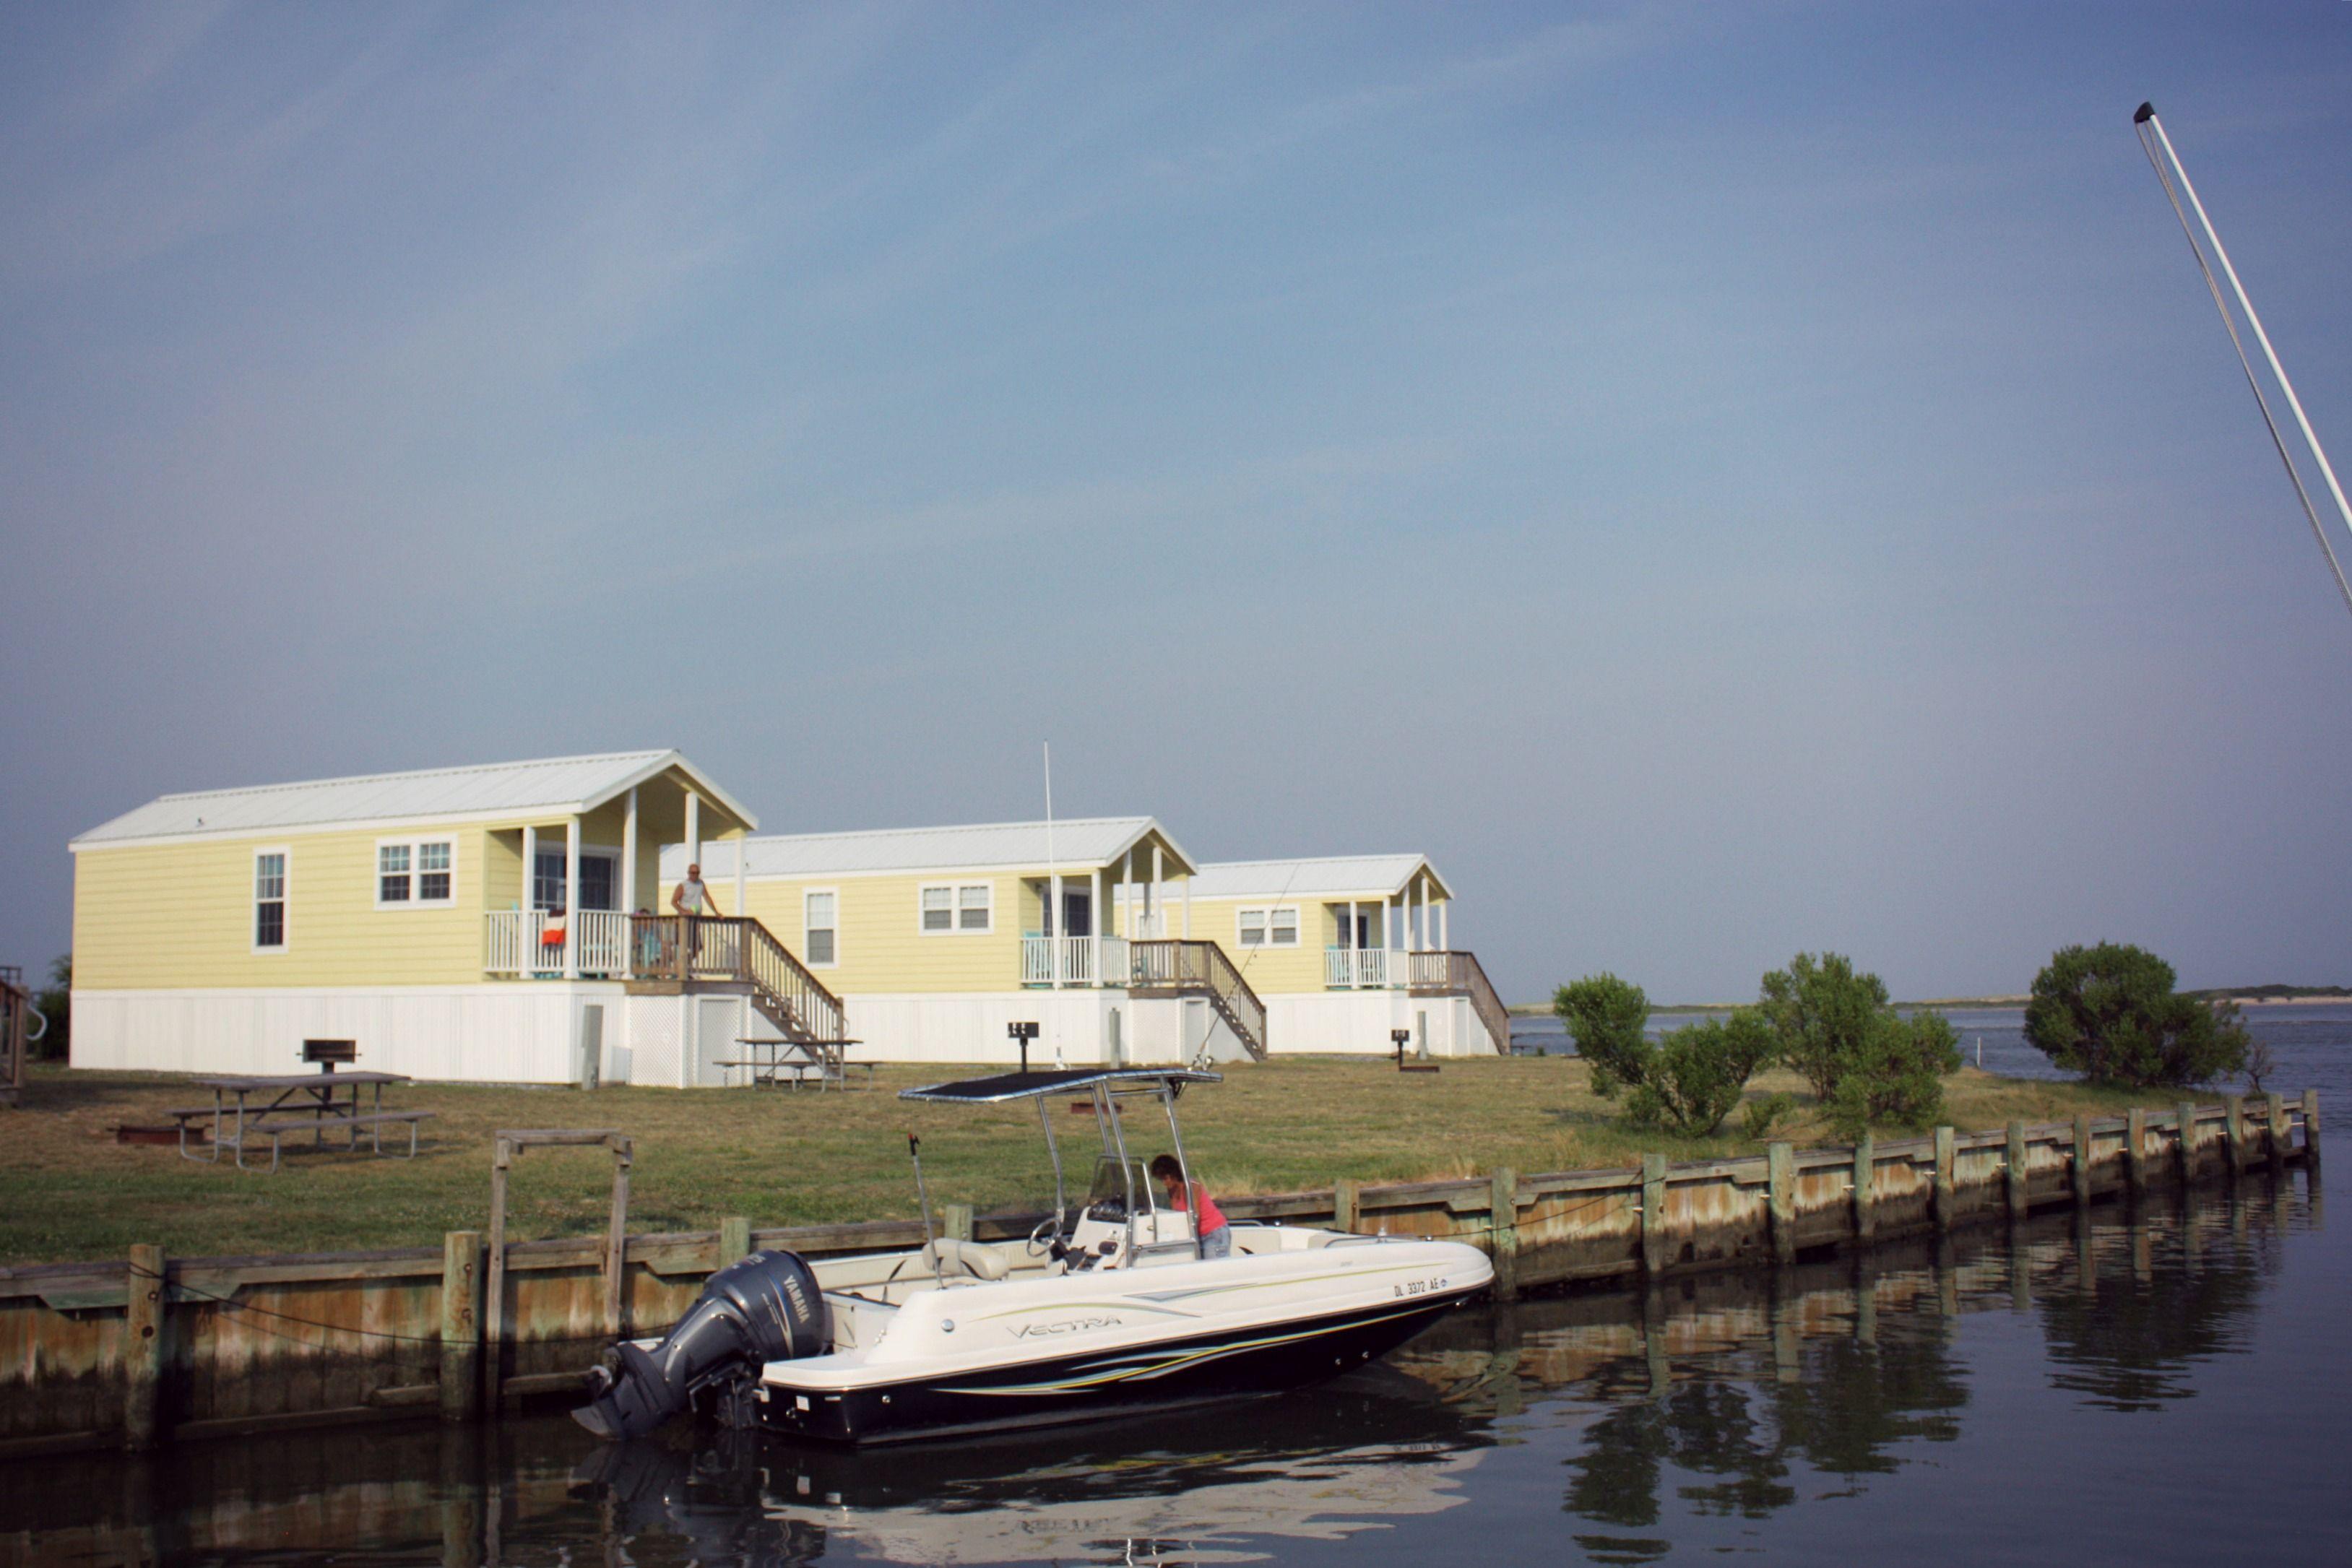 Castaways Rv Resort and Campground , Ocean City MD